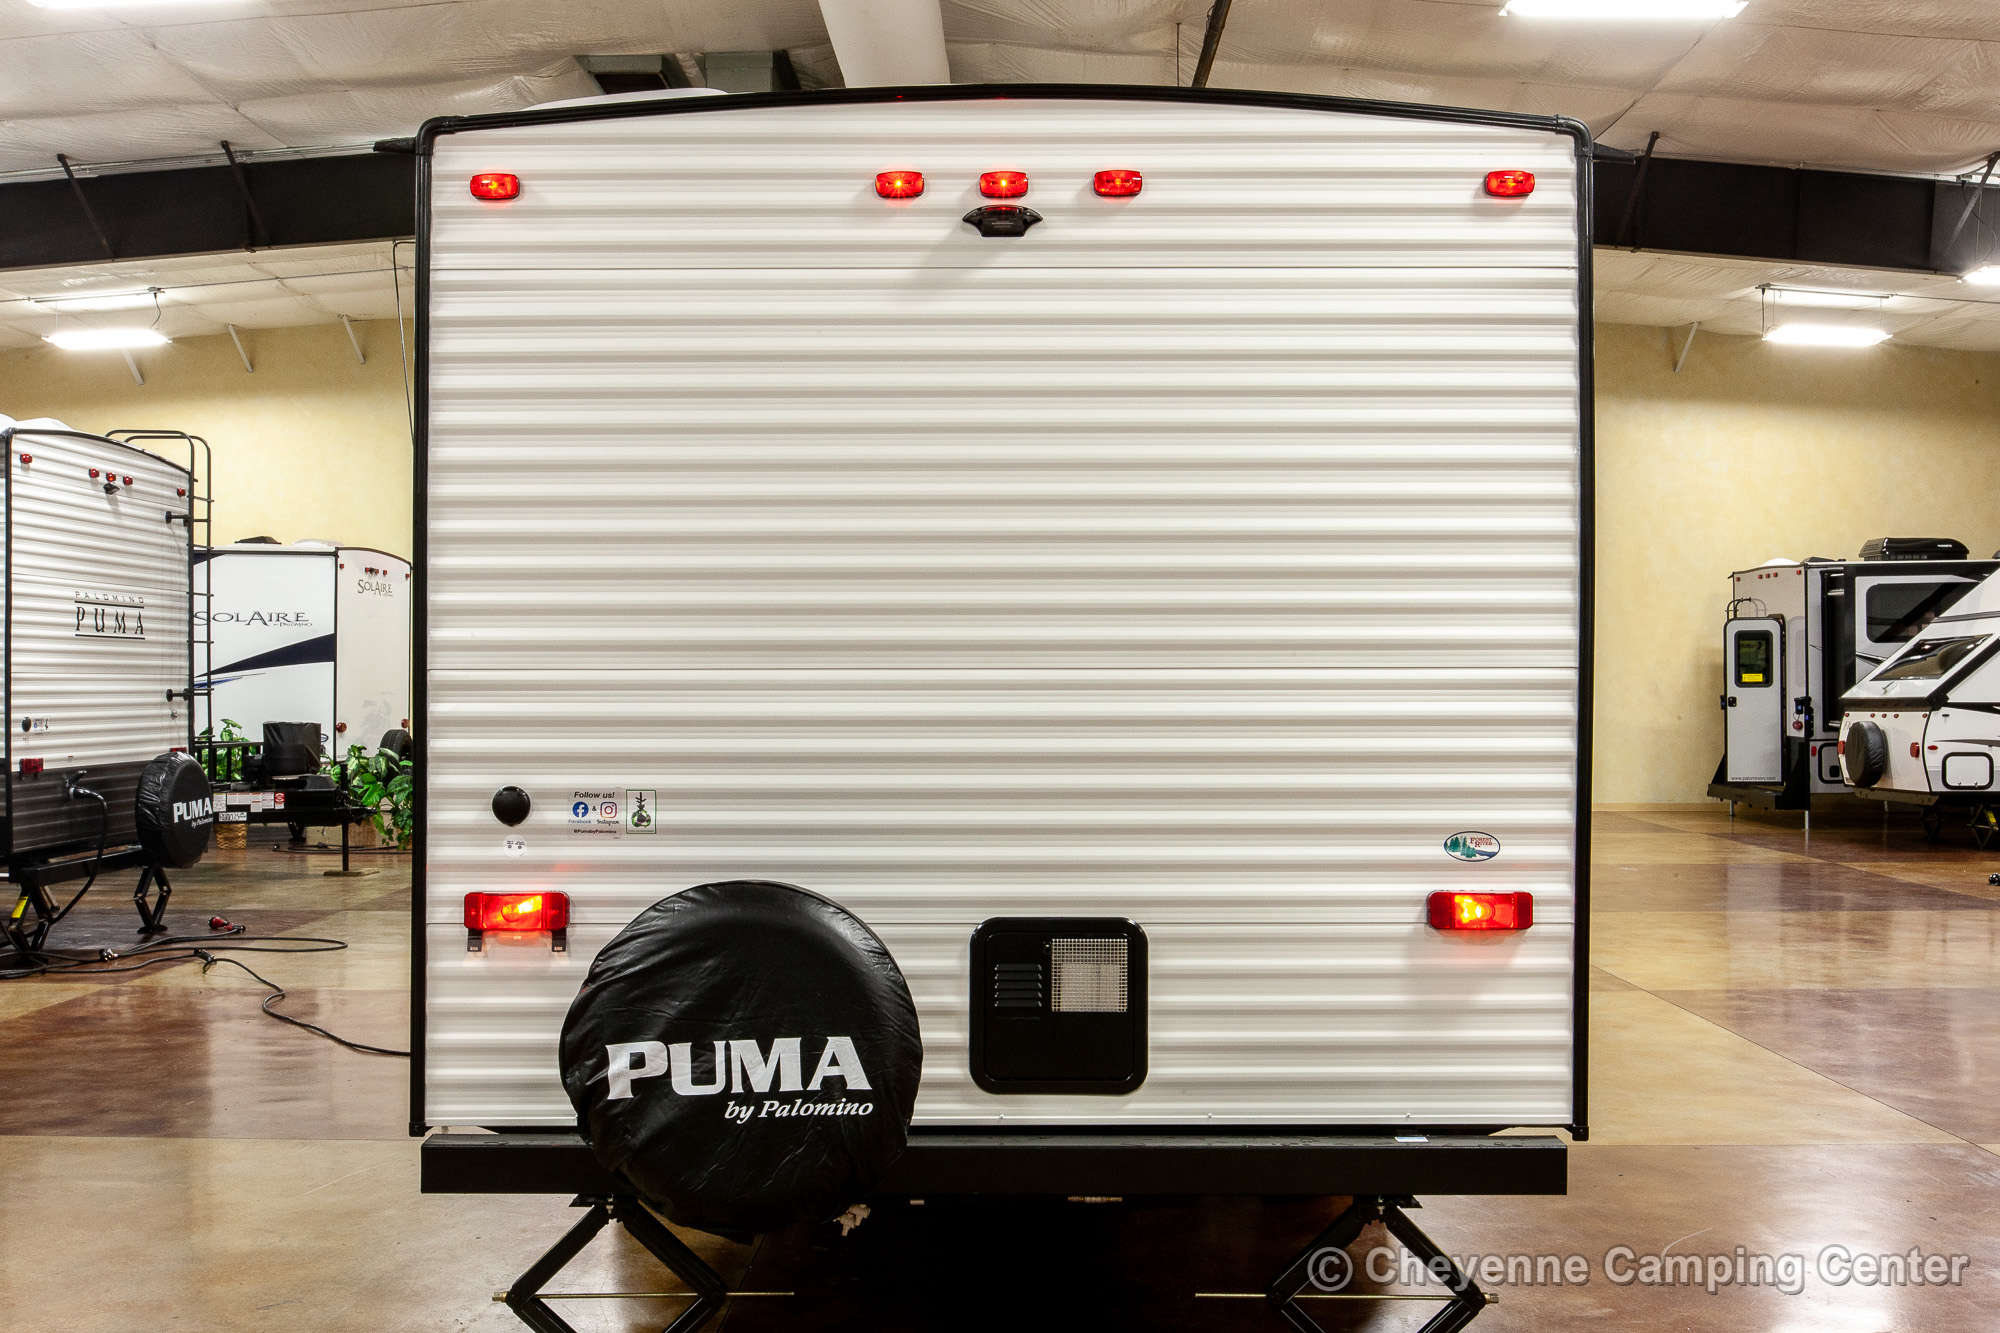 2022 Palomino Puma XLE Lite 20MBC Bunkhouse Travel Trailer Exterior Image